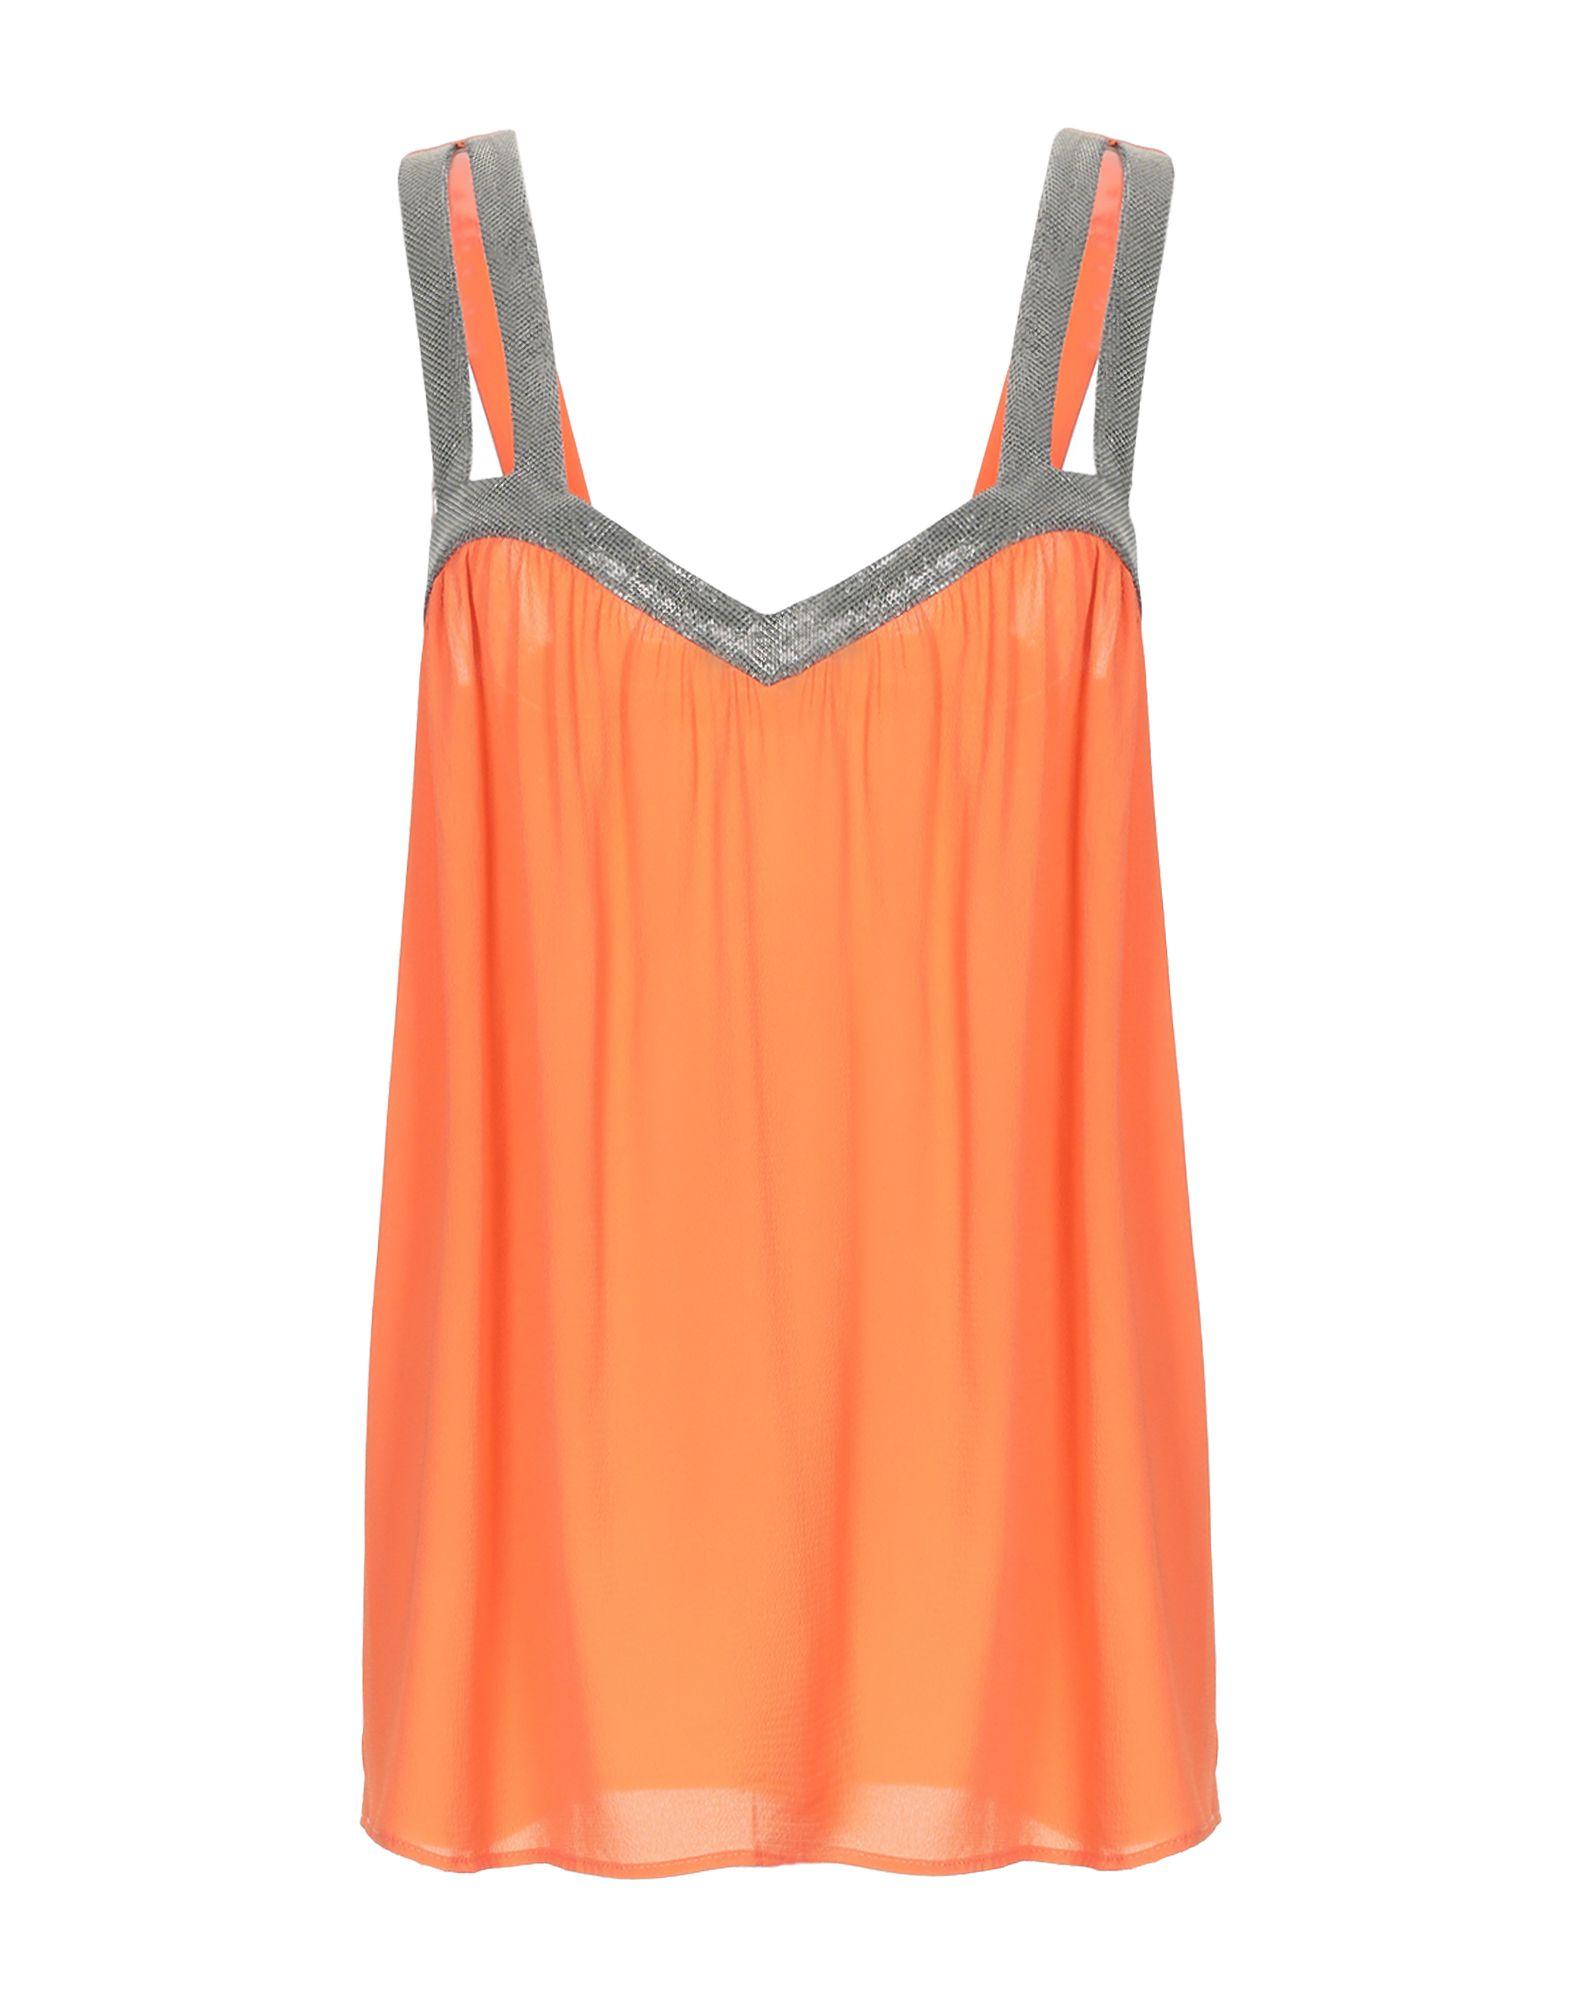 Top Top Almagores donna - 12287388NR  Outlet Online-Shop